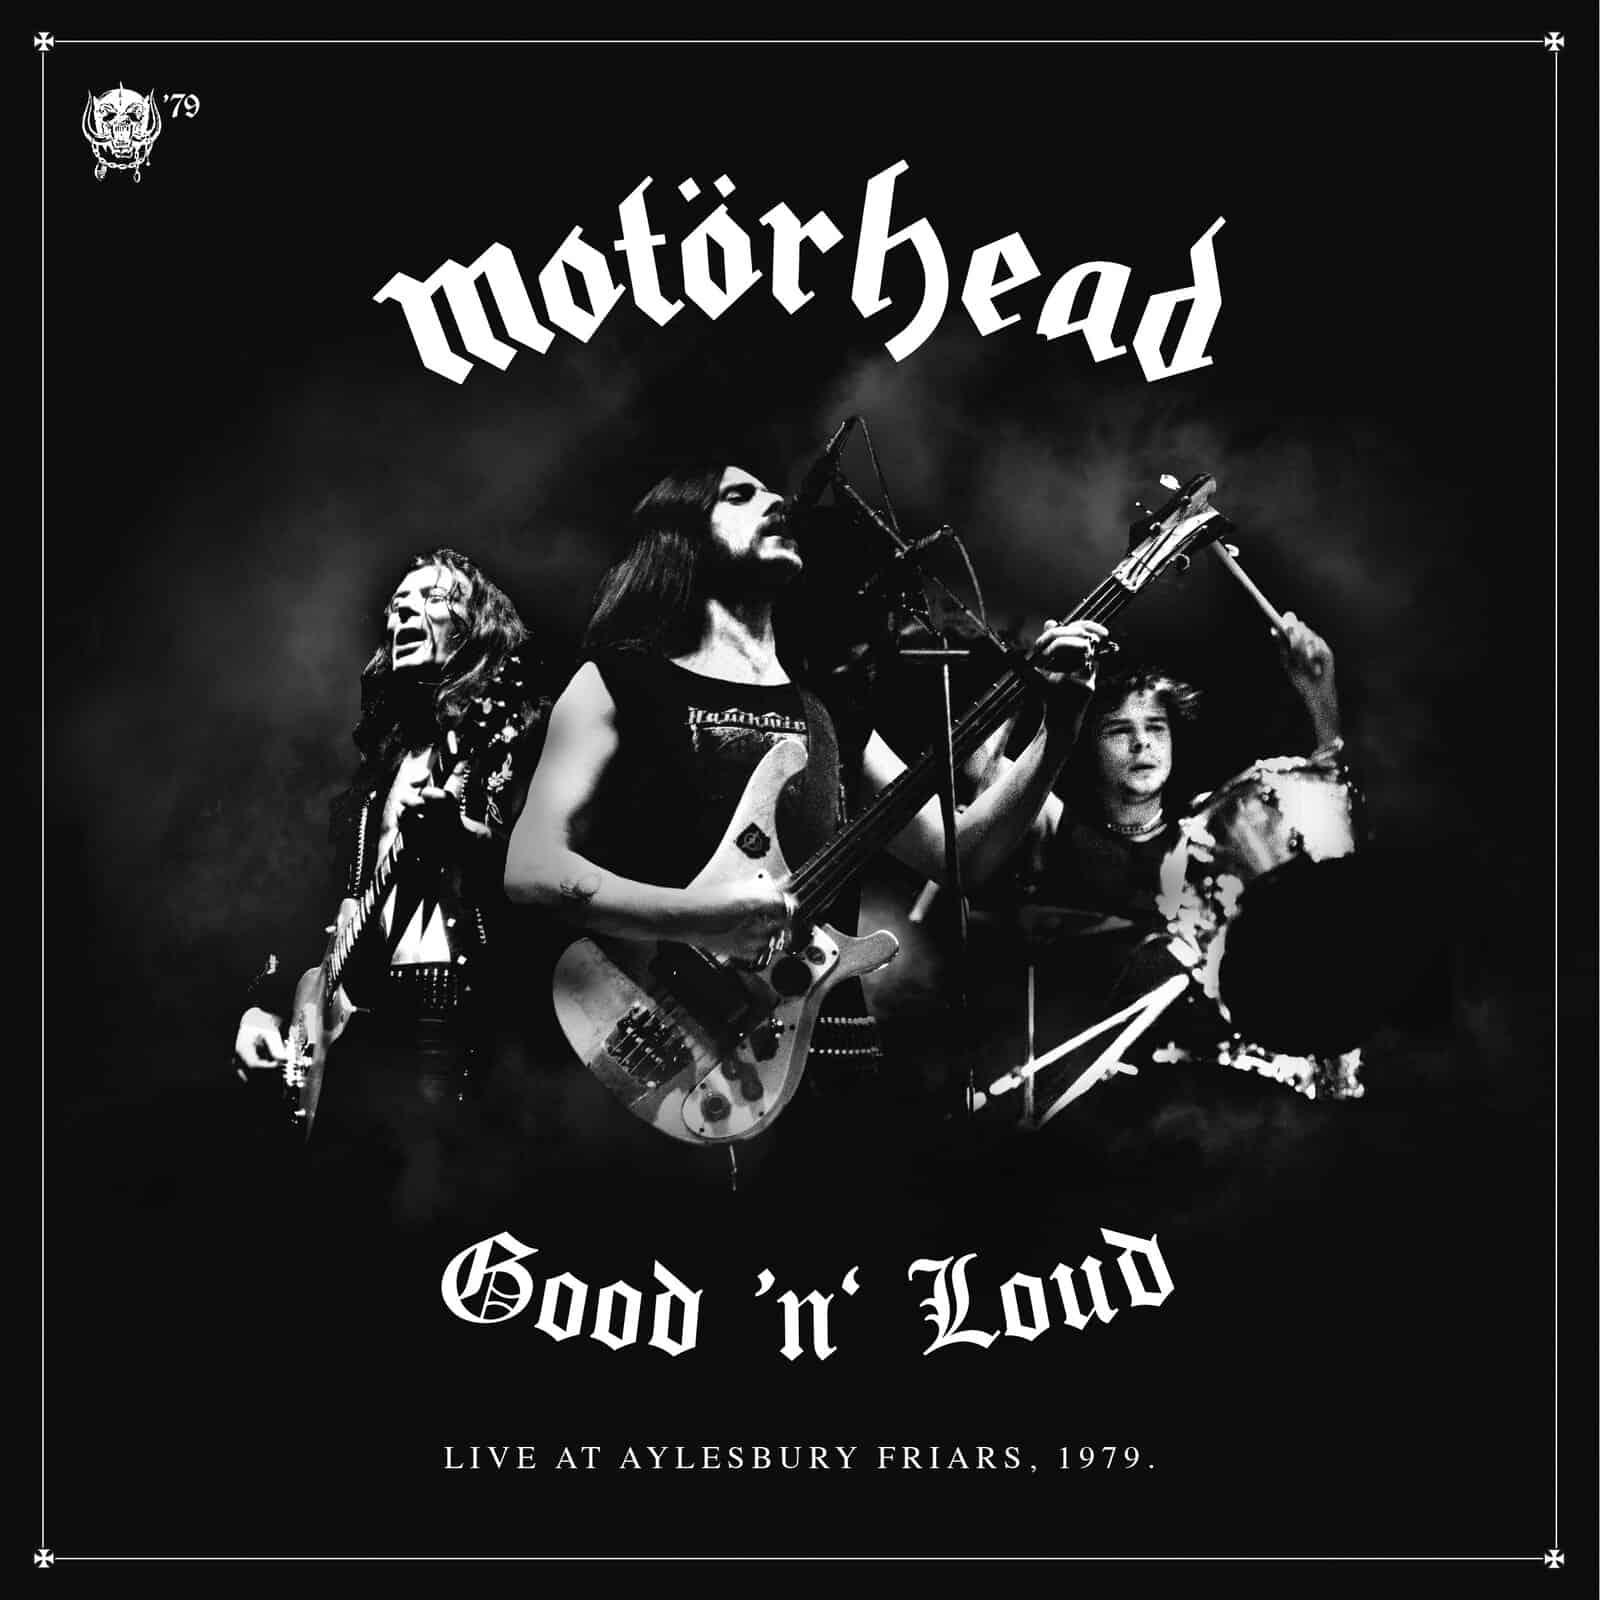 Motorhead Live at Aylesbury